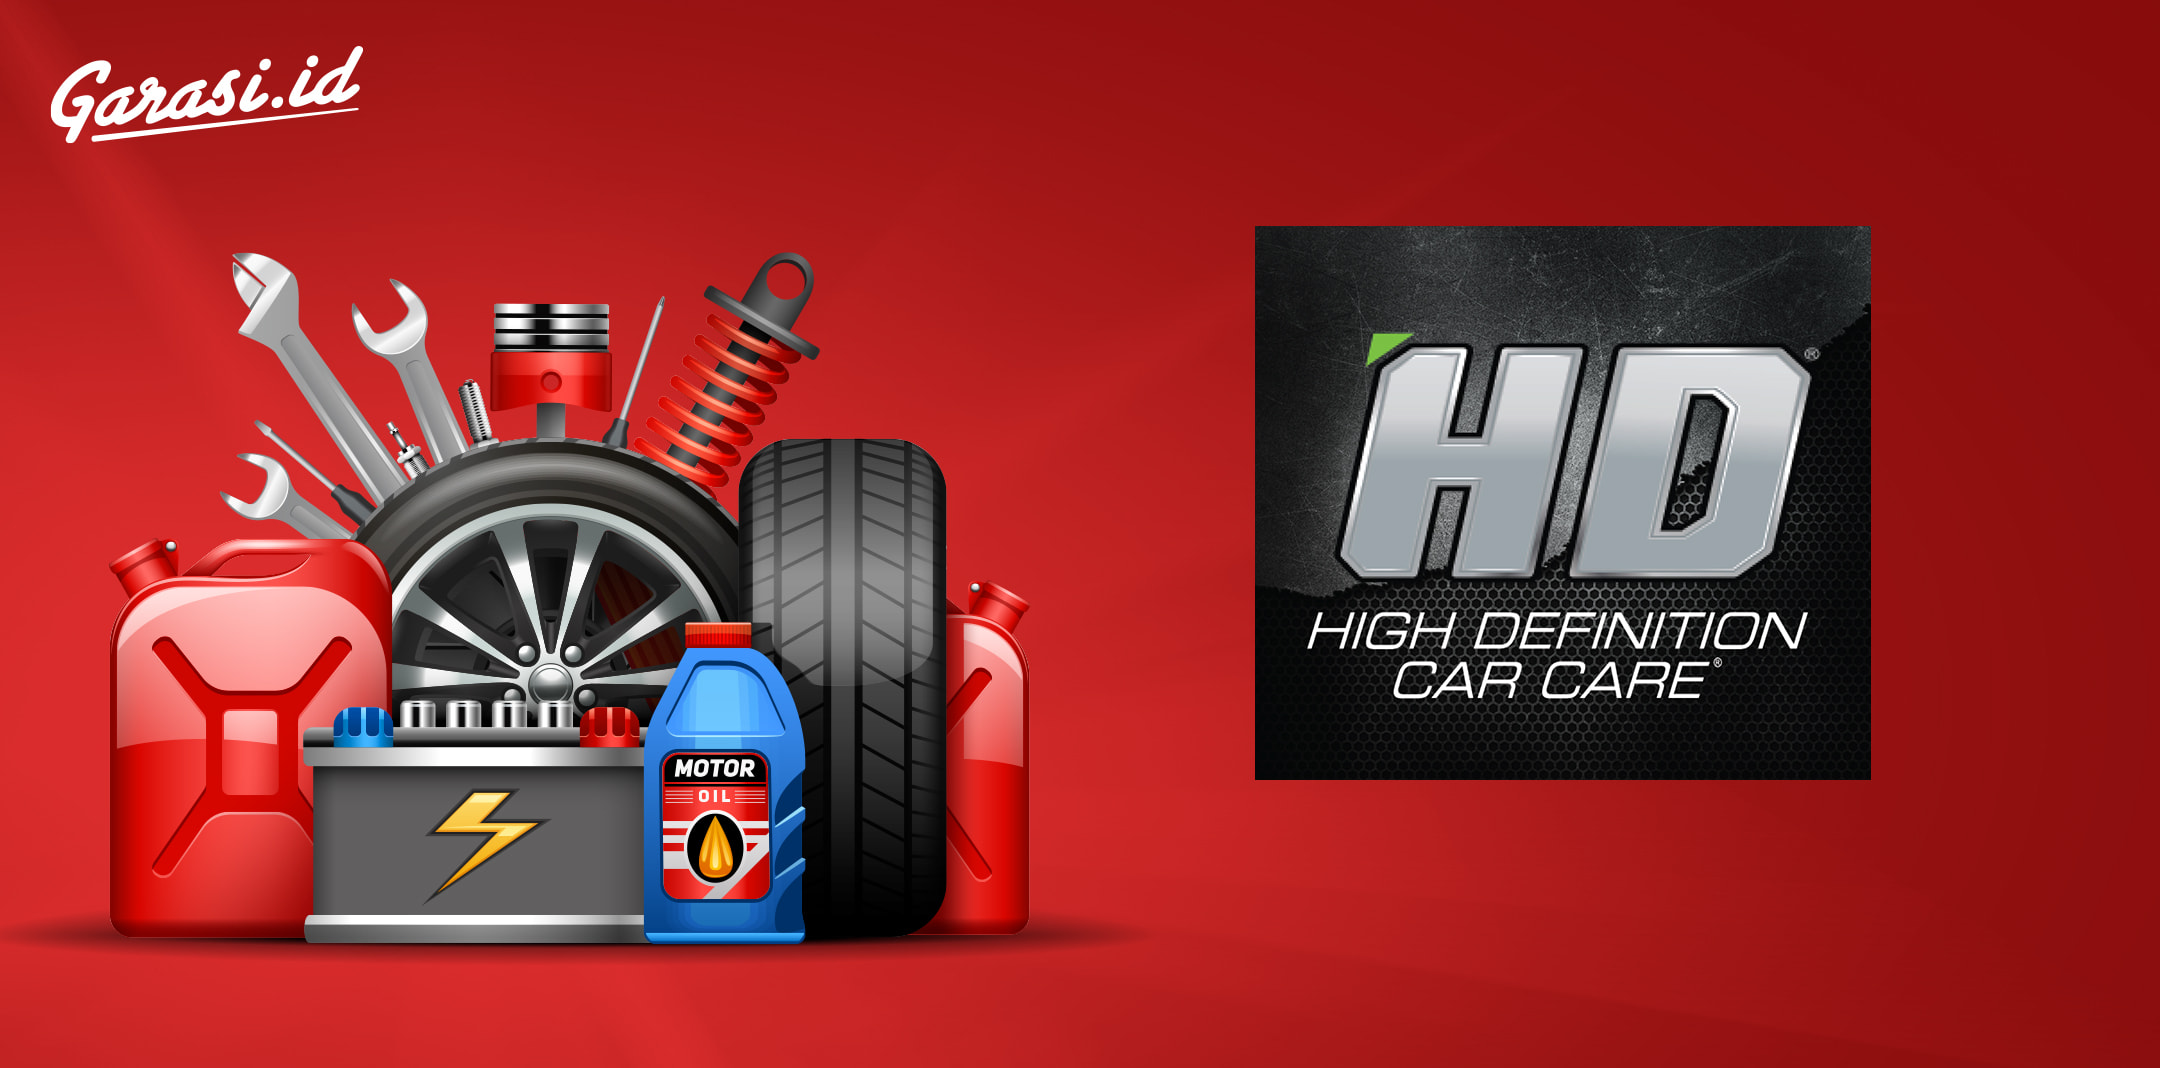 HD Car Care